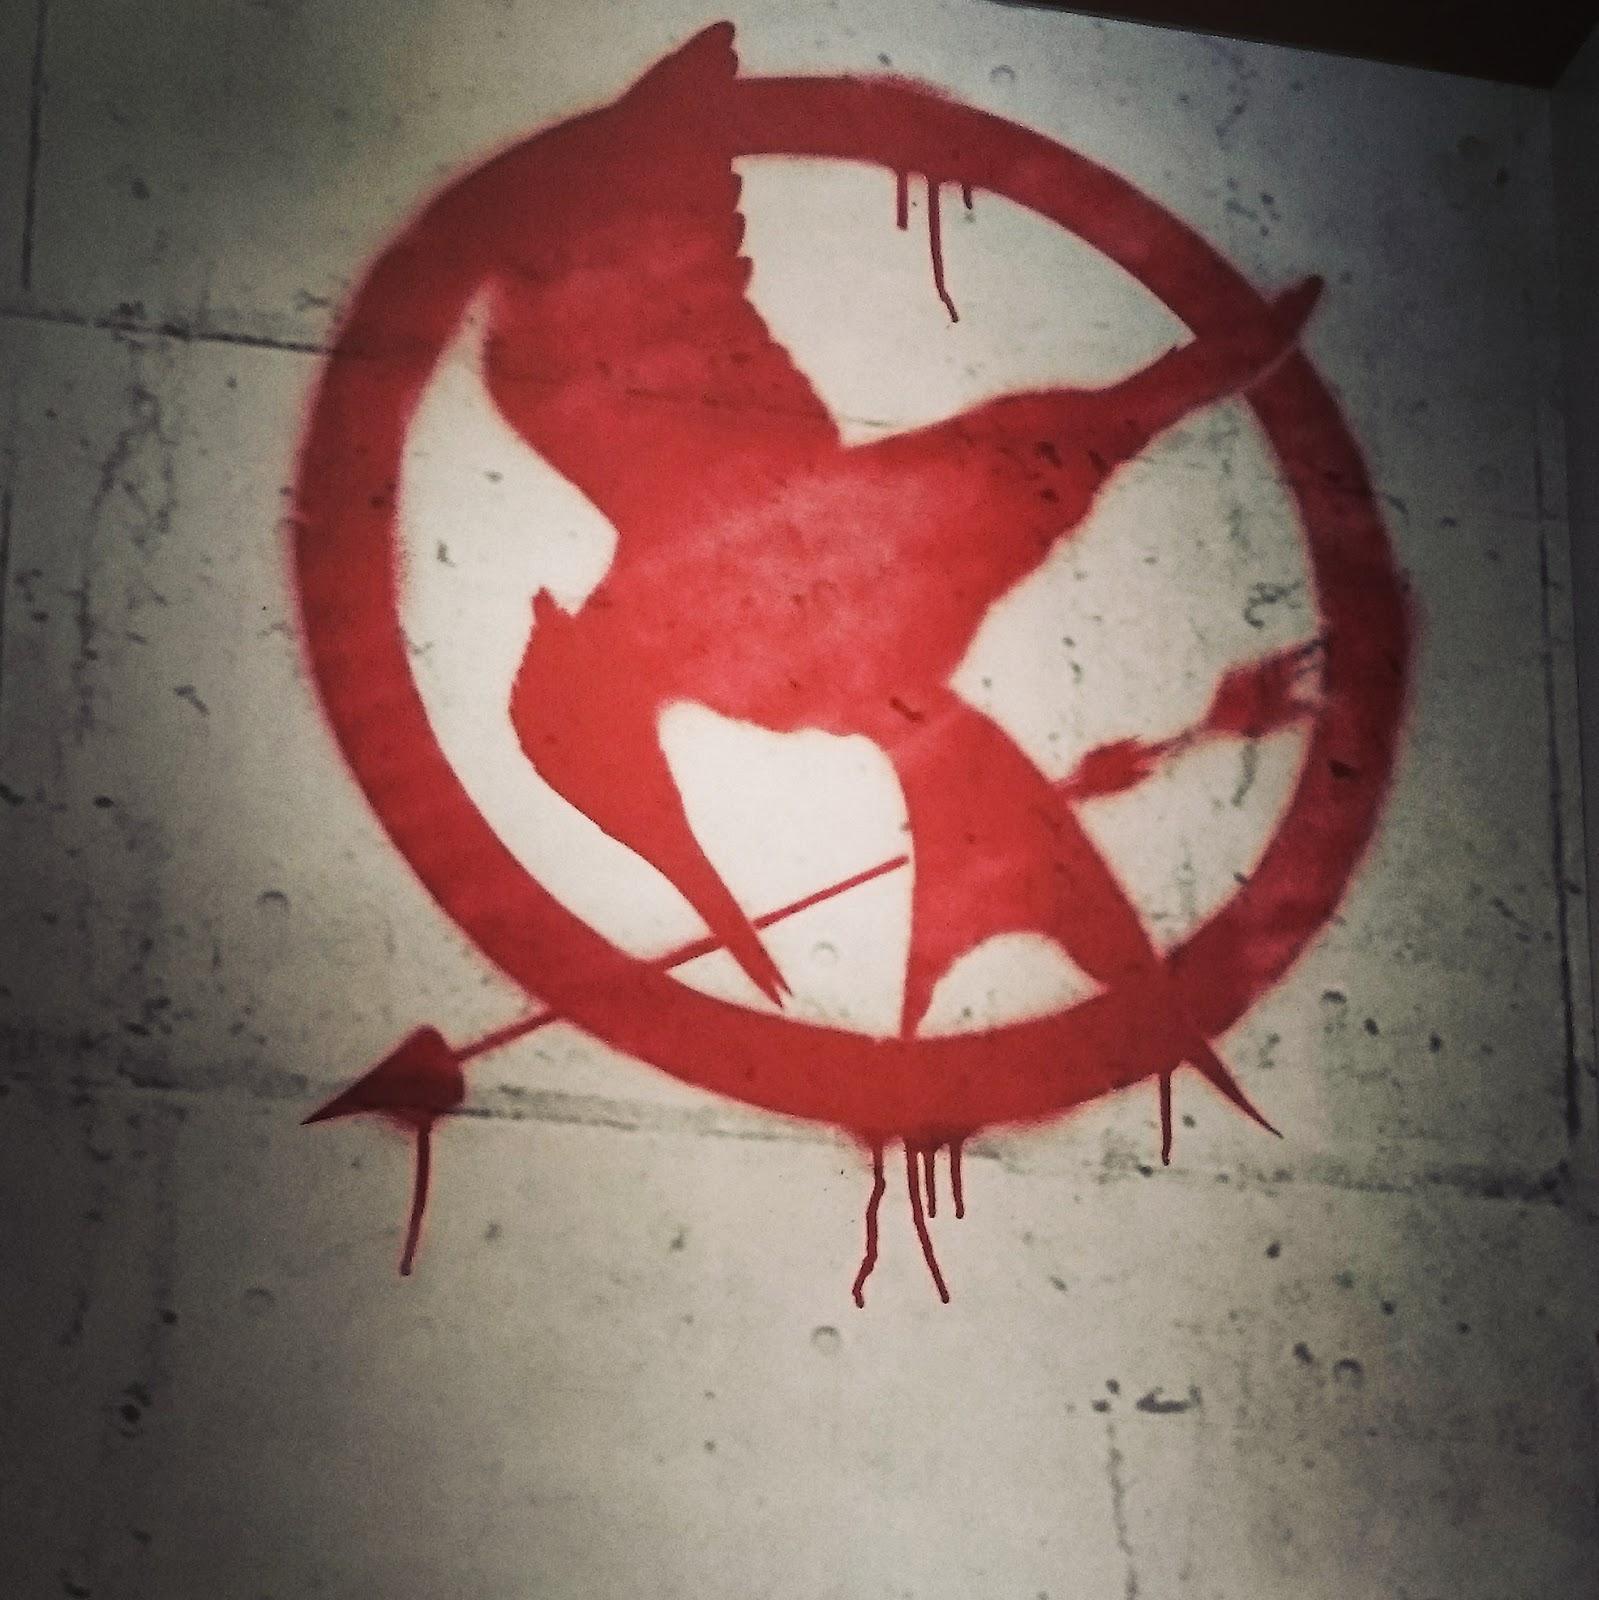 Mockingjay symbol at Hunger Games Exhibition